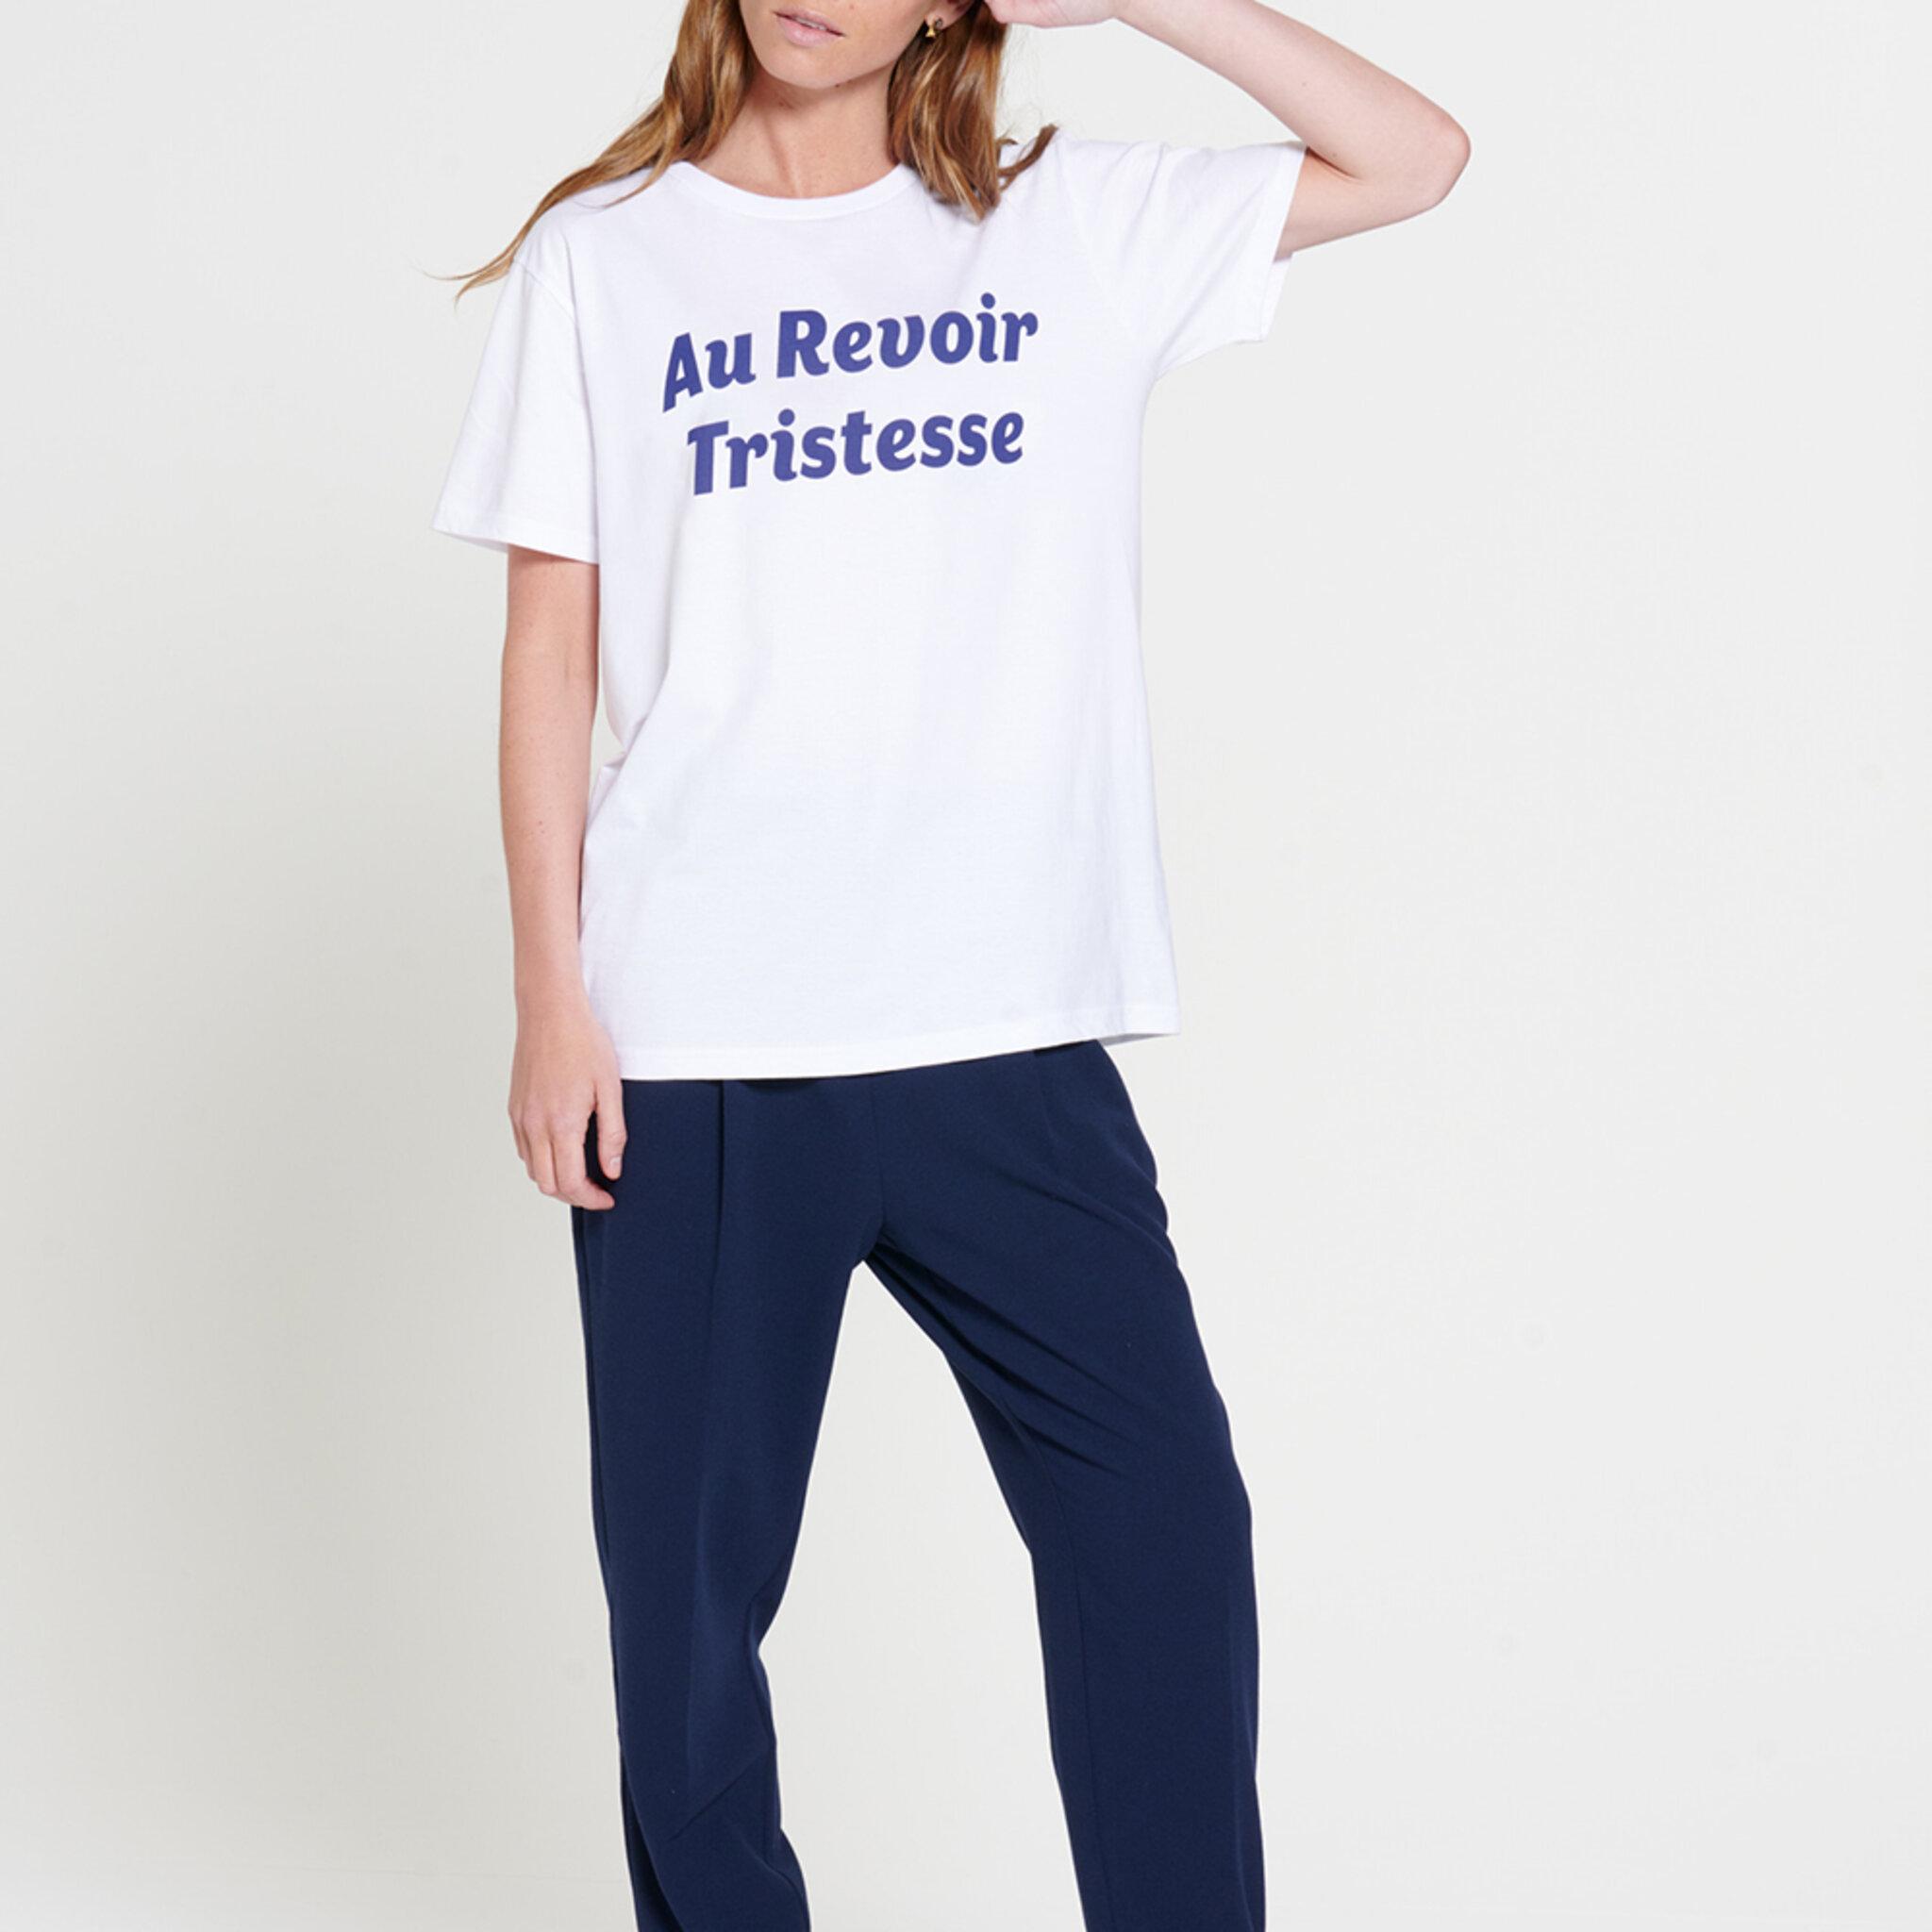 Au Revoir Tristesse - T-shirt Med Tryck